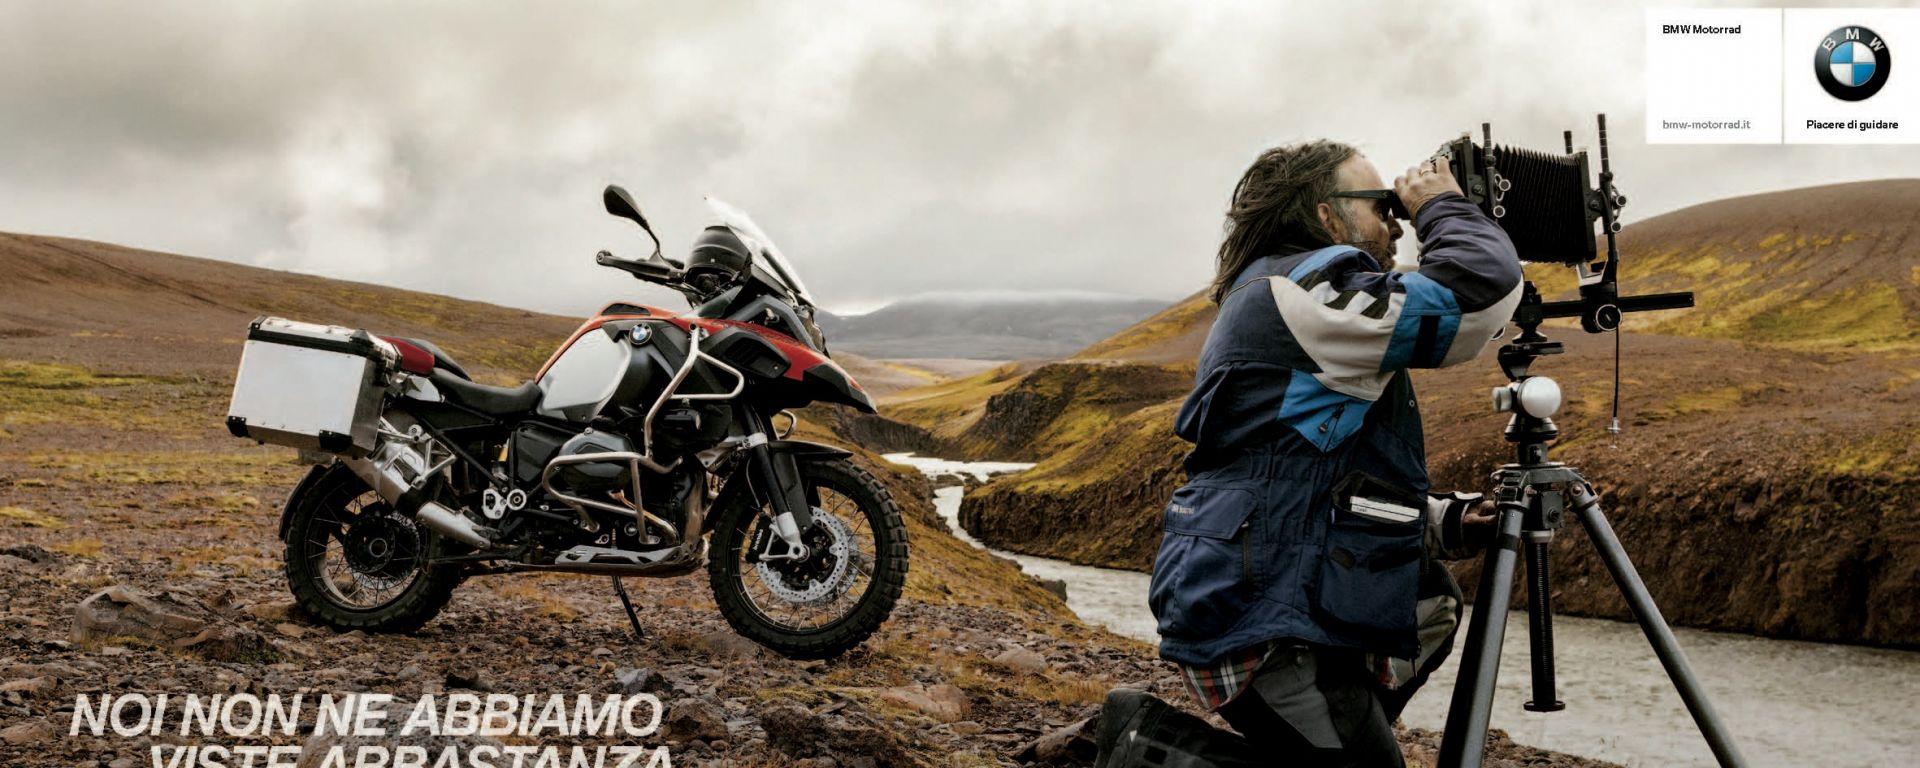 BMW Motorrad Start of Season 2016